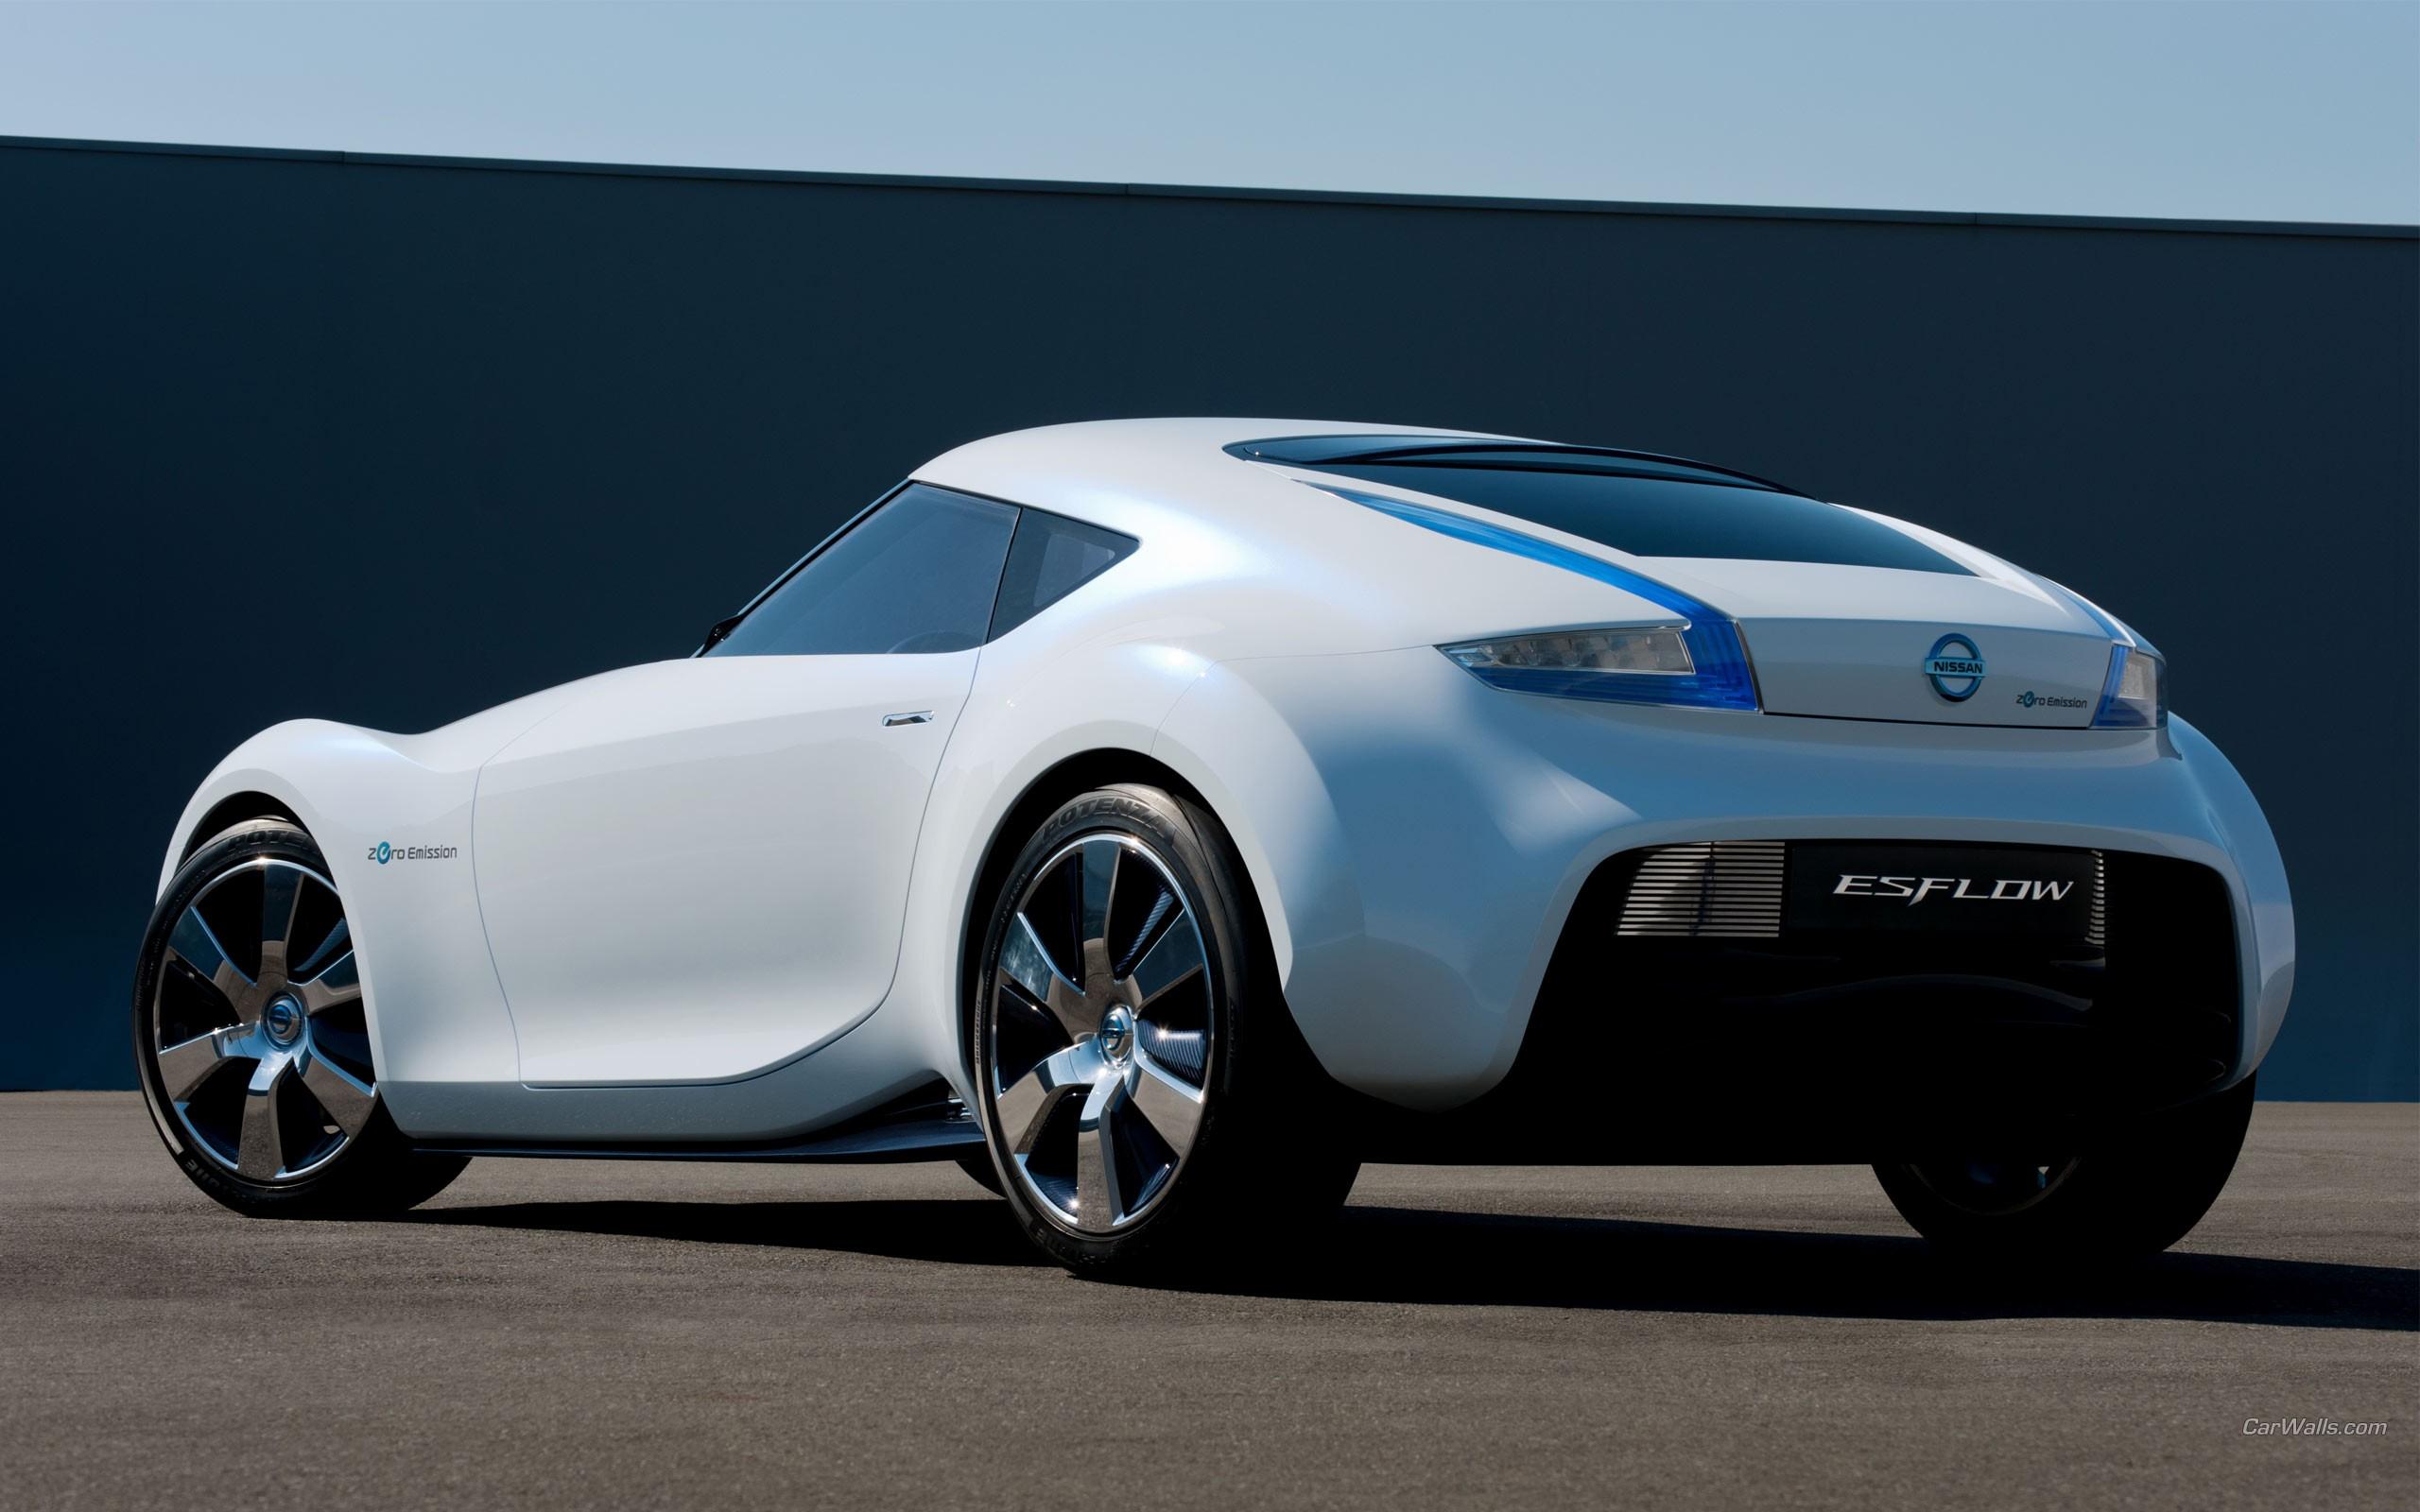 Nissan Esflow - 2560x1600